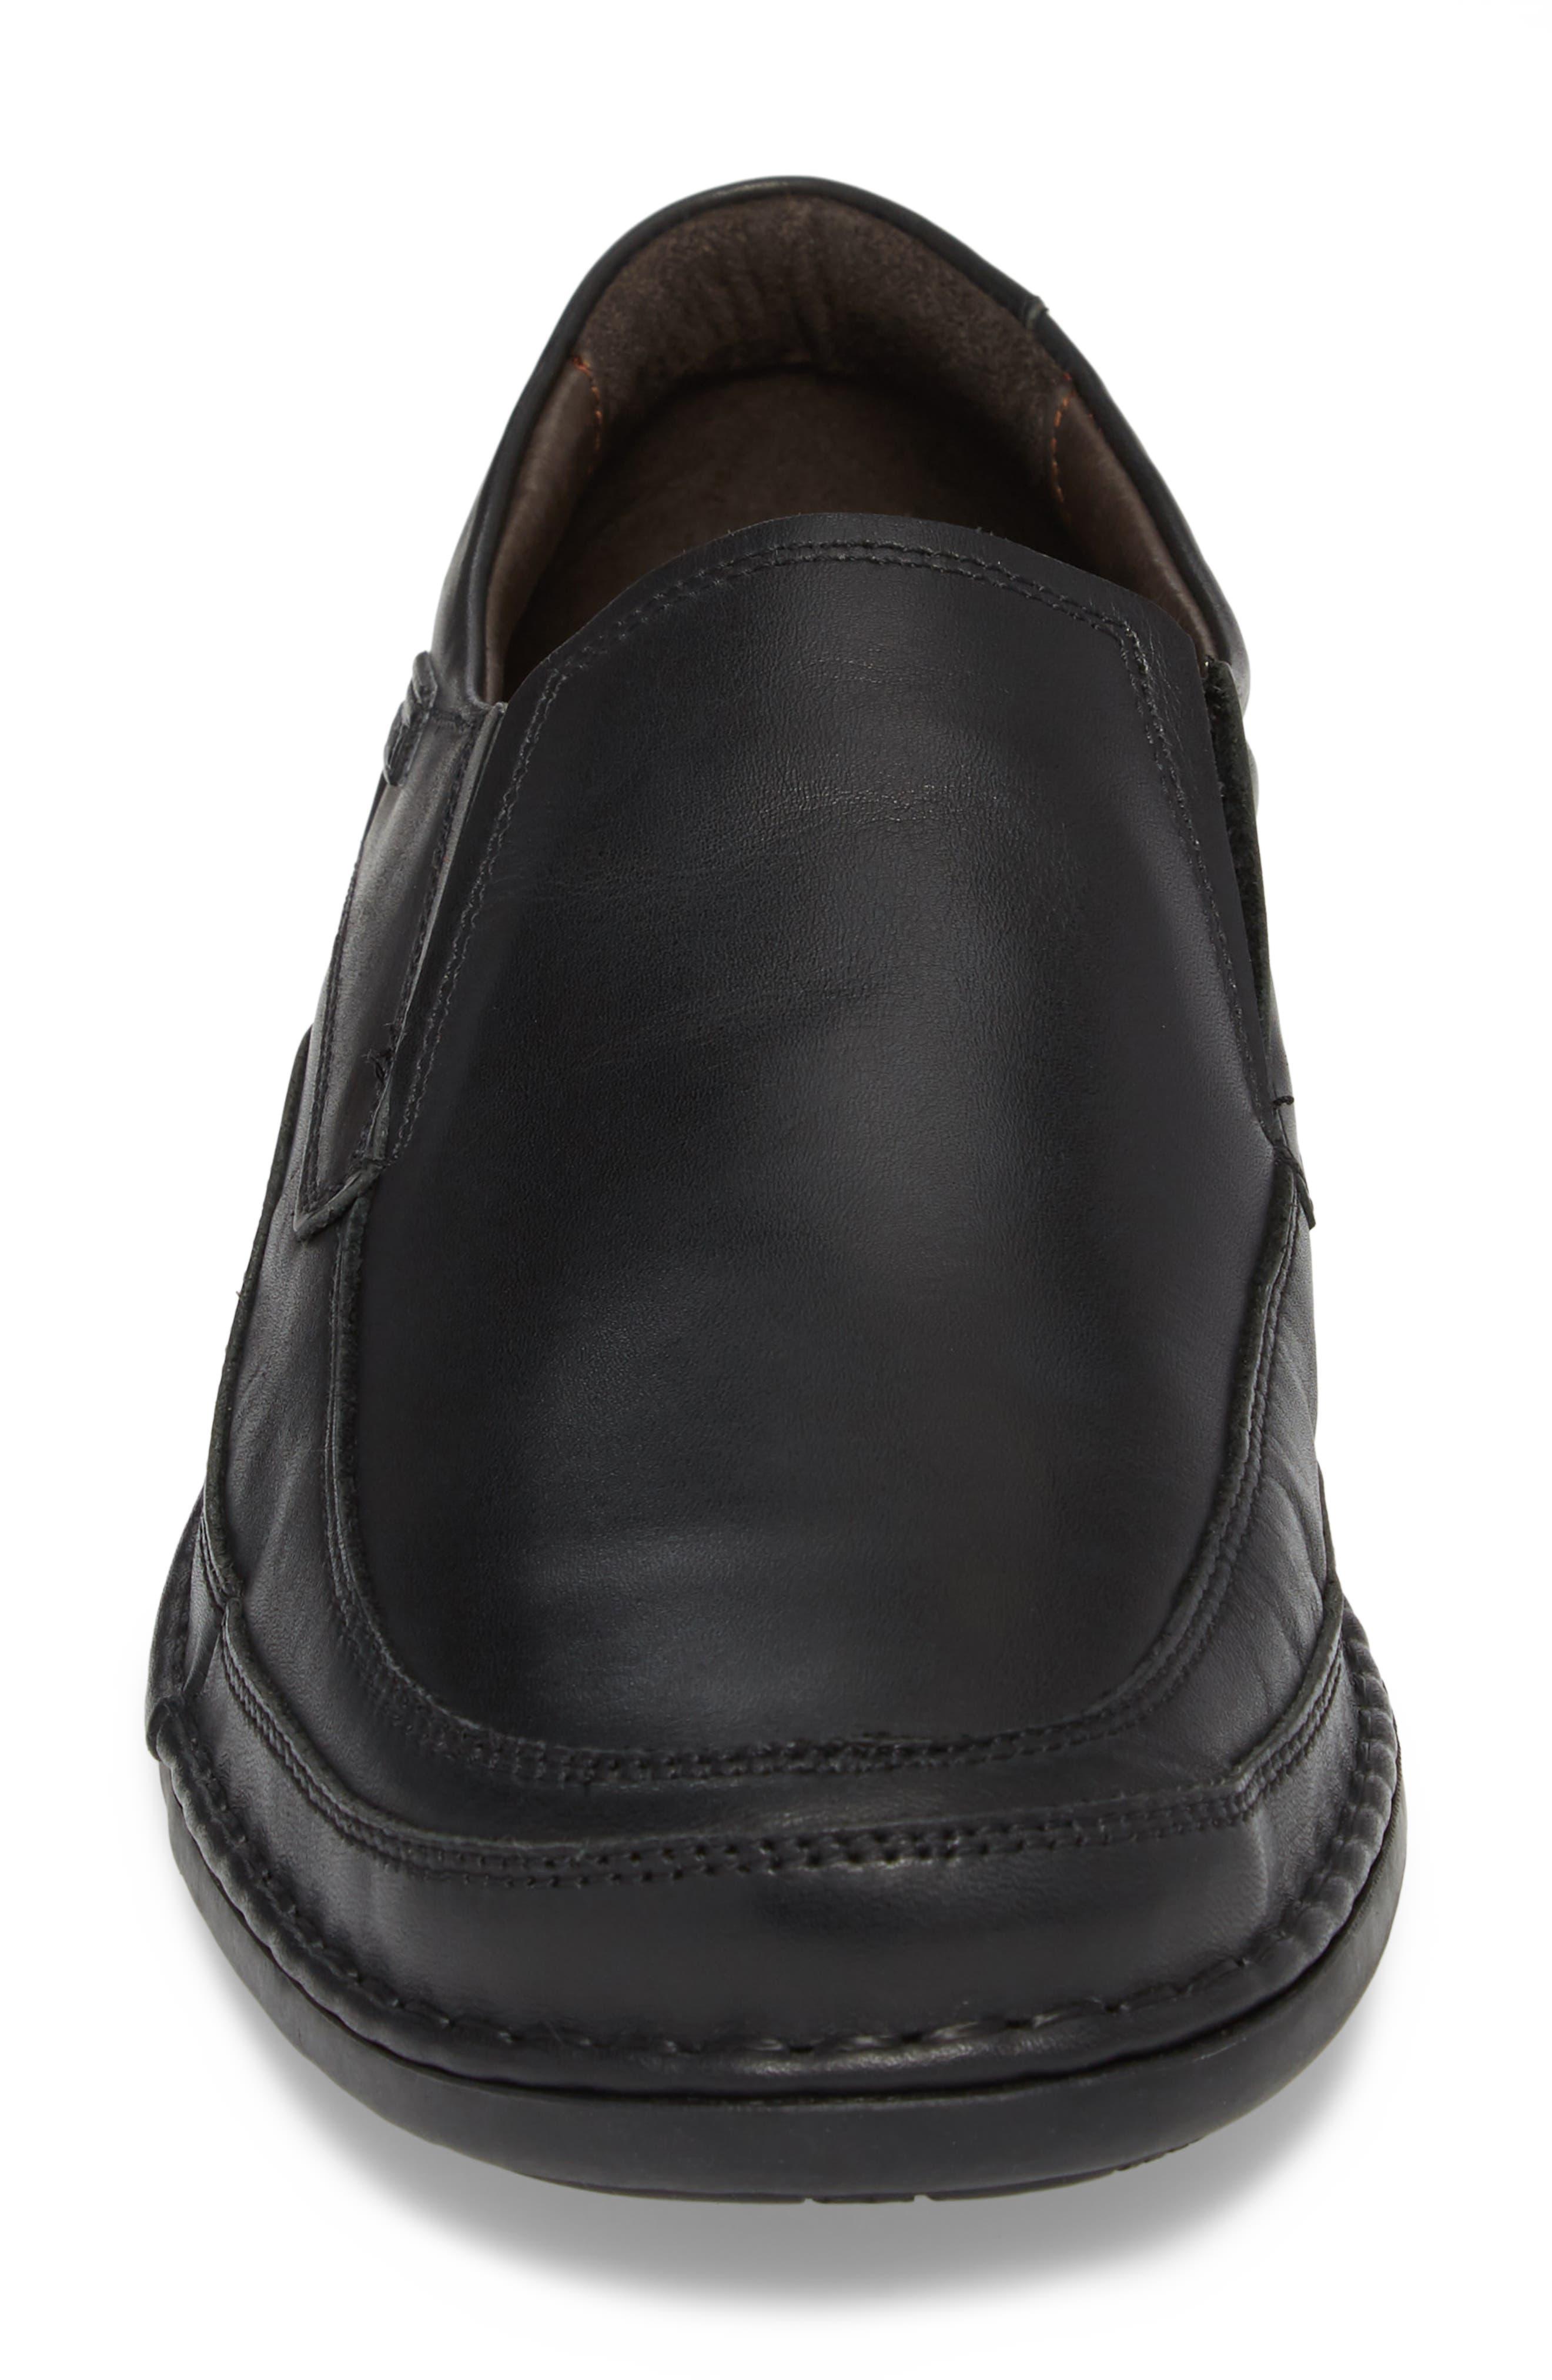 'Oviedo' Slip-On,                             Alternate thumbnail 4, color,                             Black Leather